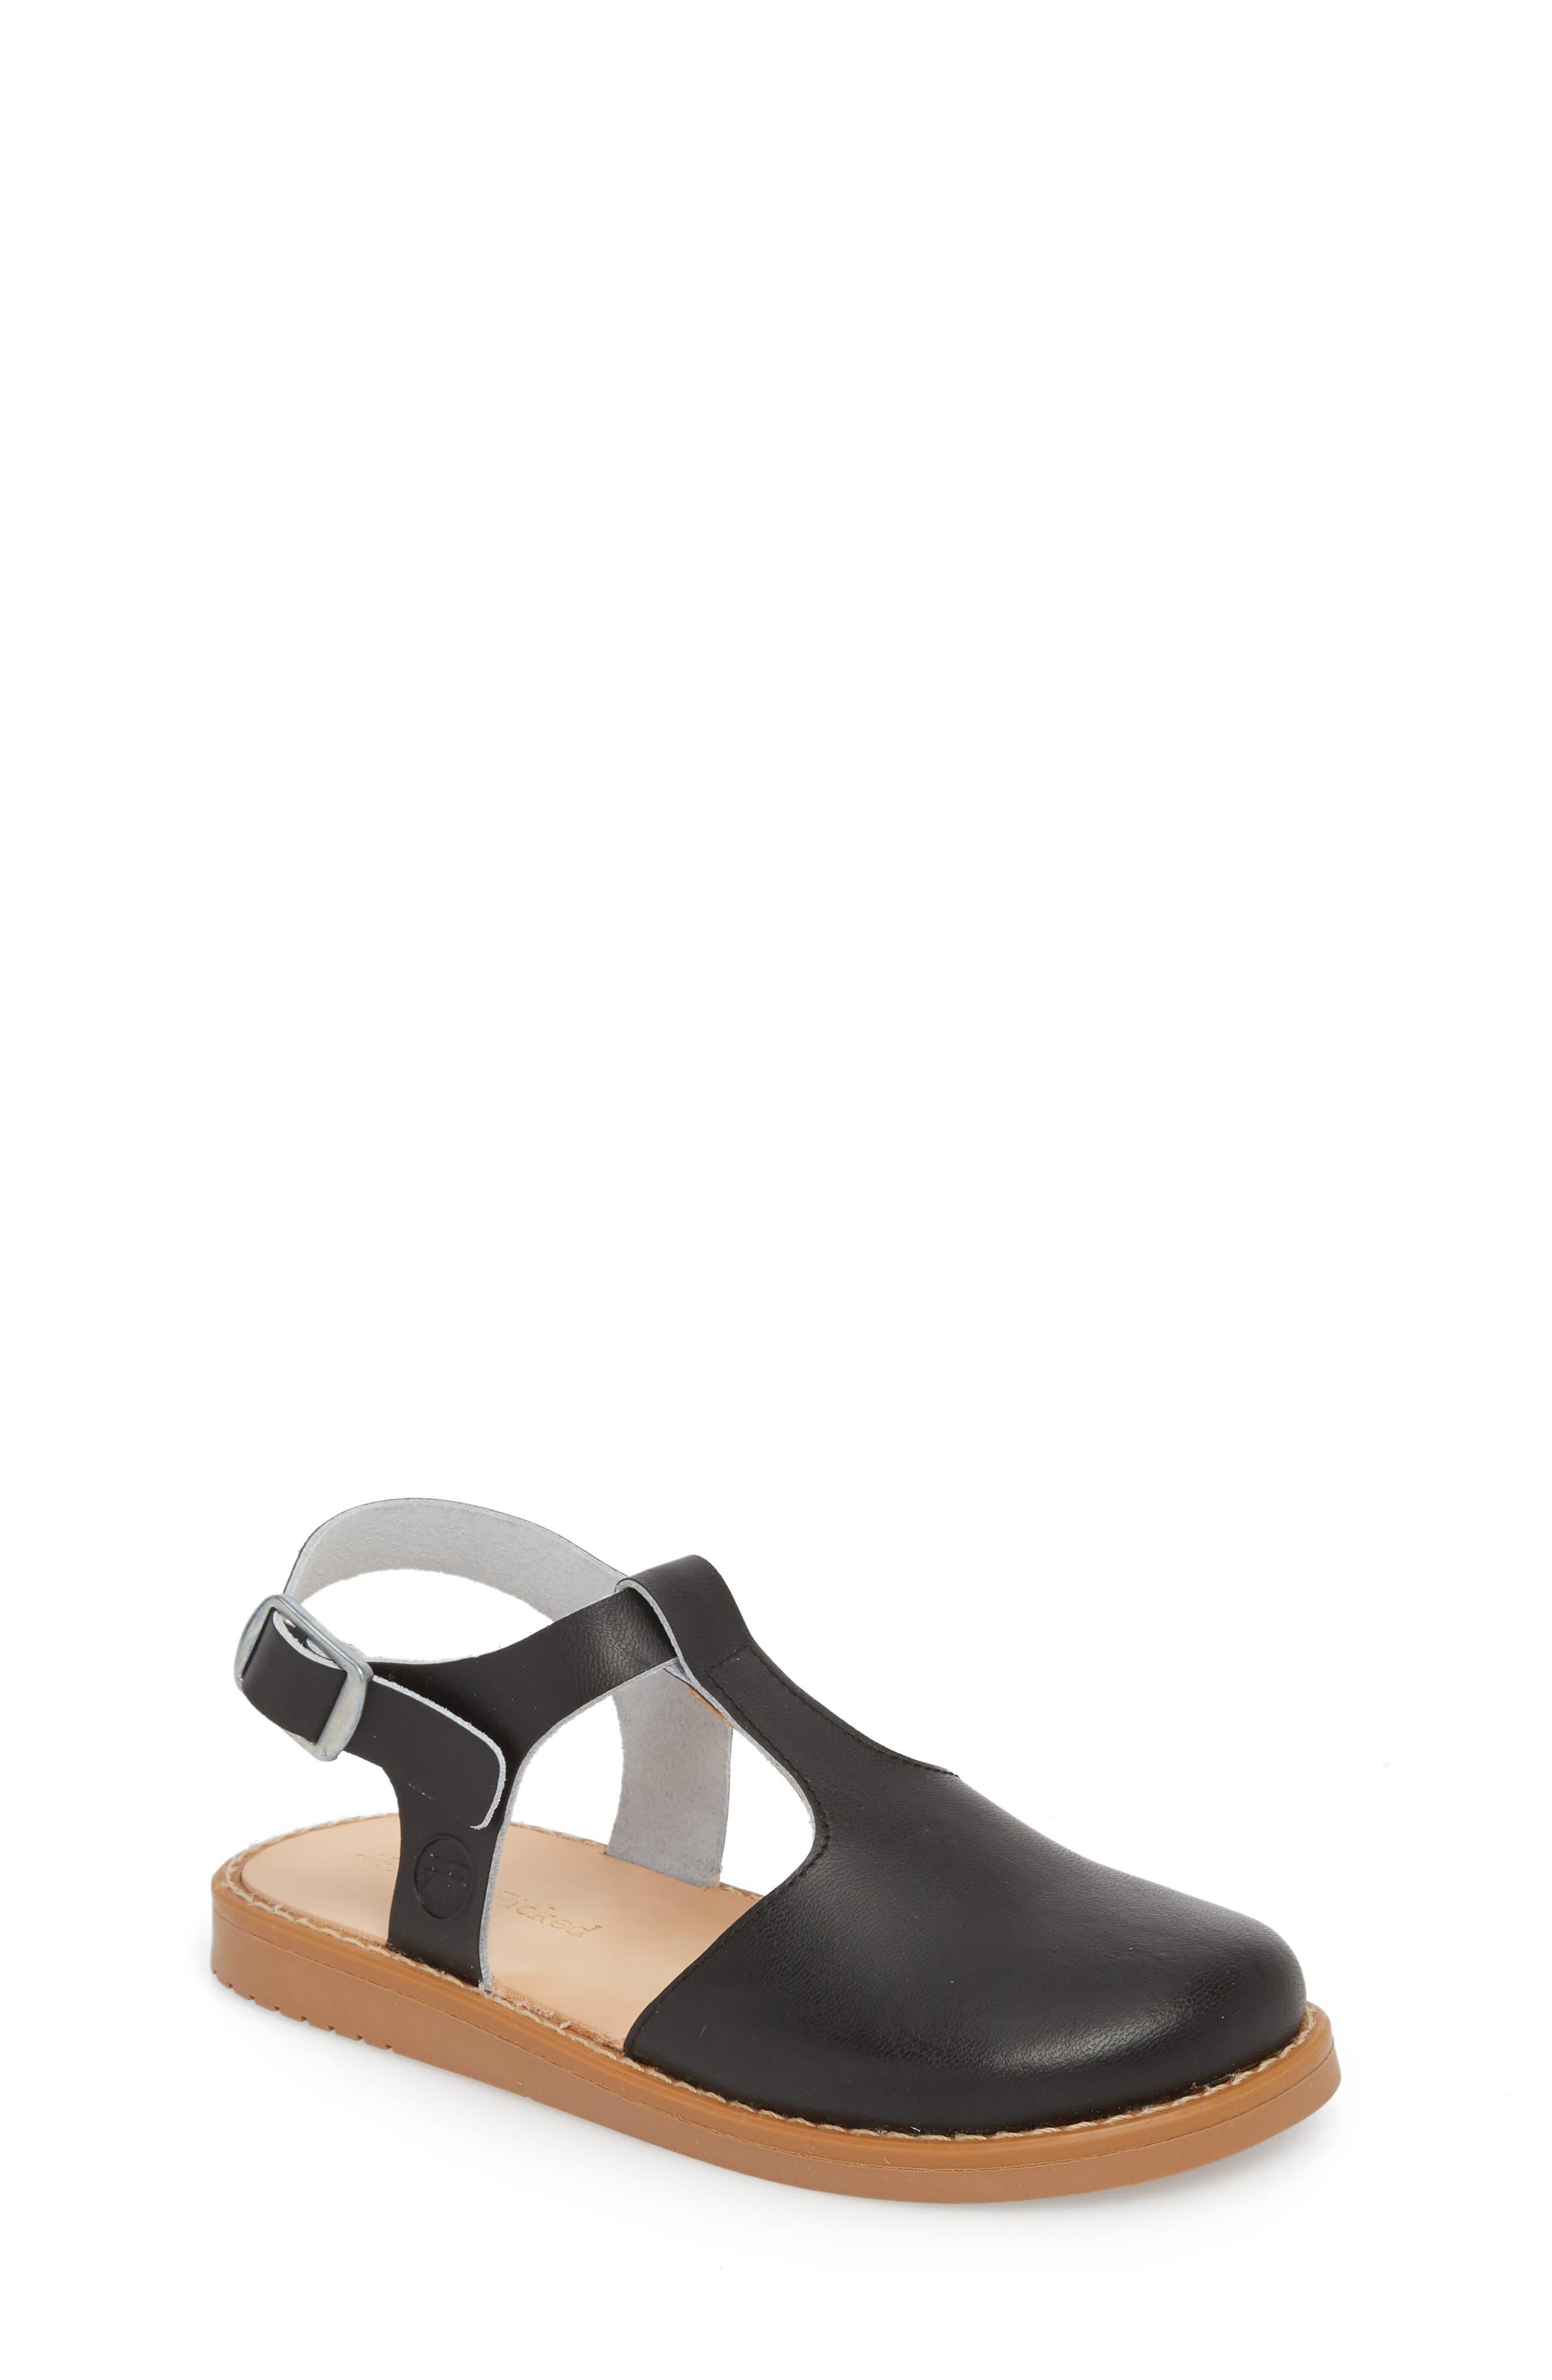 FRESHLY PICKED Newport Clog Sandal, Main, color, 001